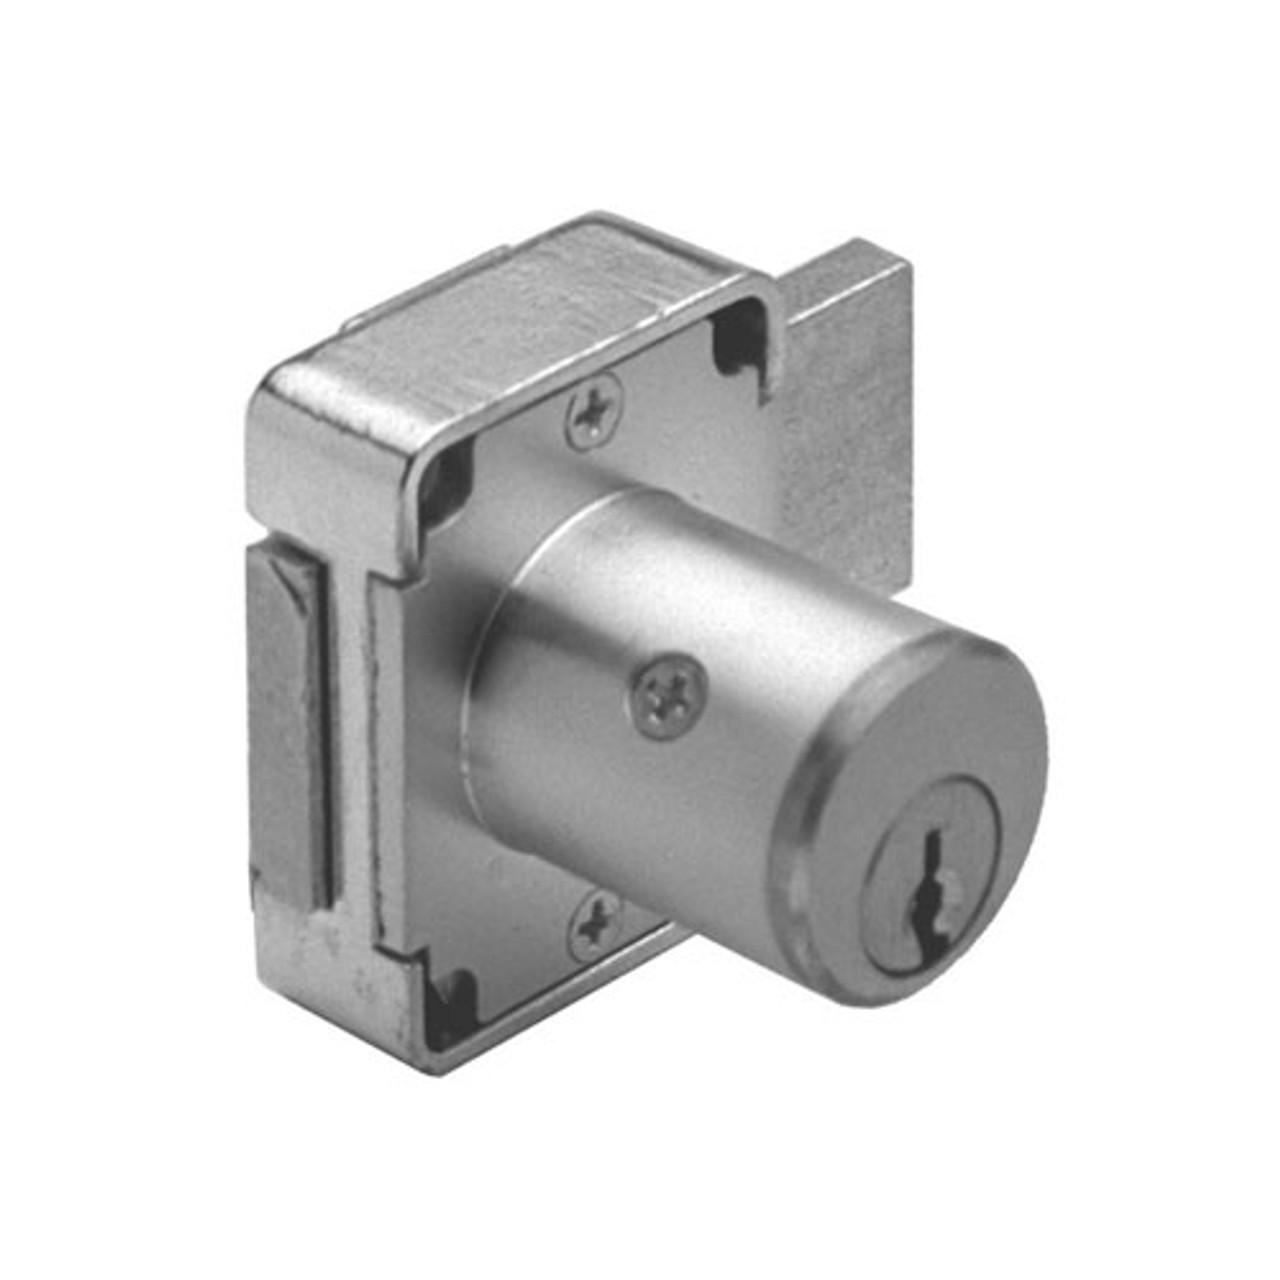 Olympus 100DR-KD-26D-1-3/8 Deadbolt Locks in Satin Chrome Finish